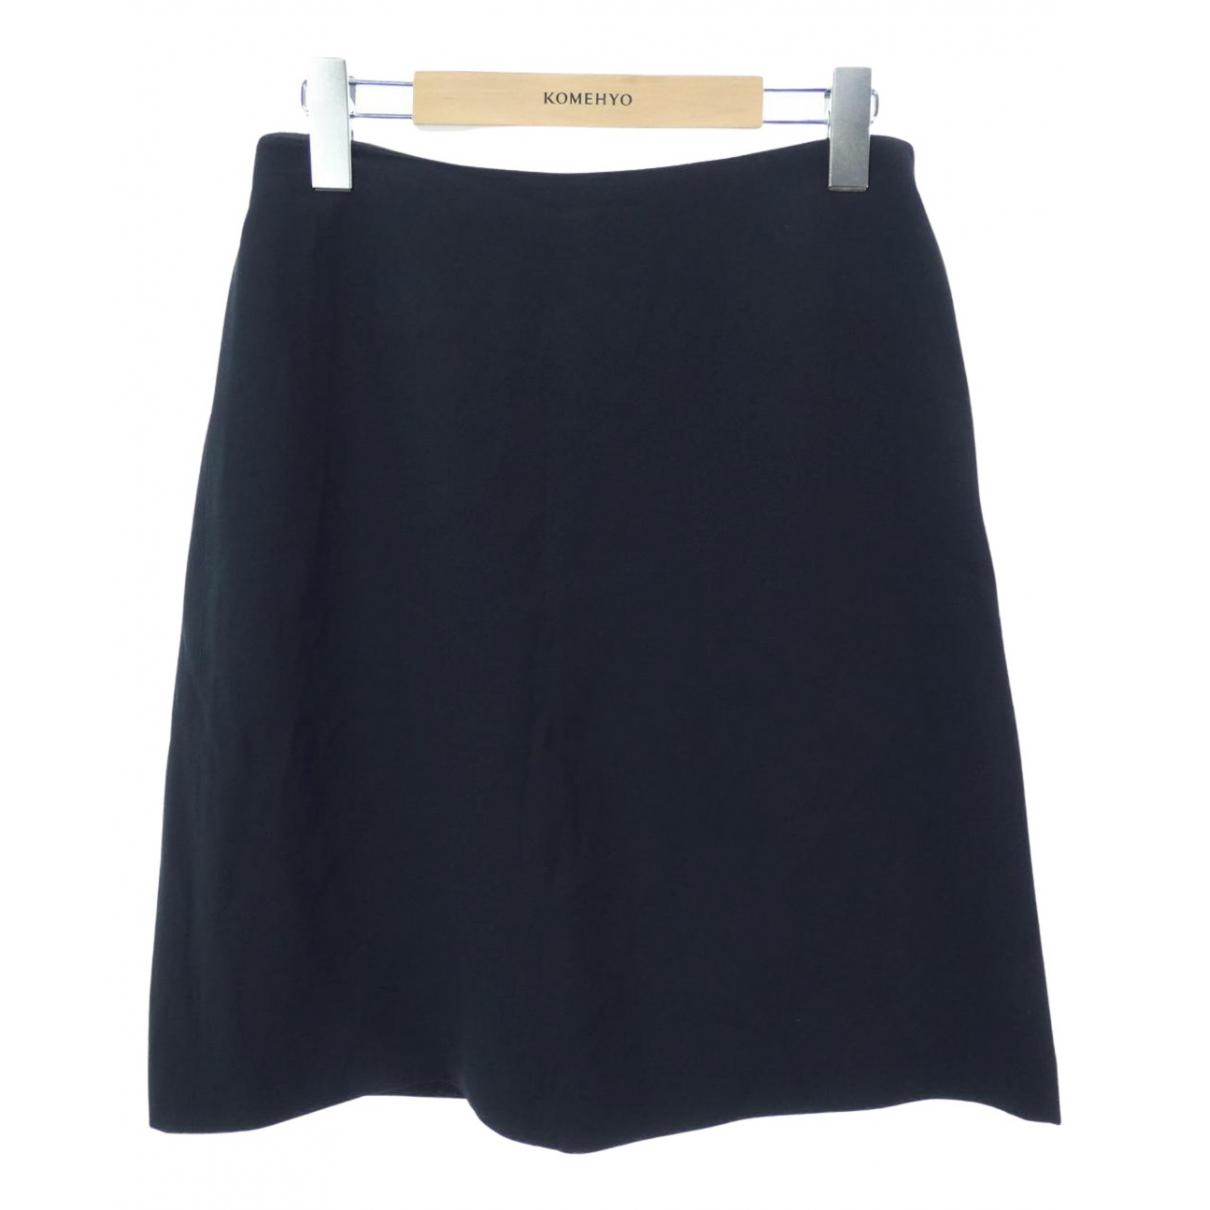 Prada N Black Cotton Trousers for Women 40 IT